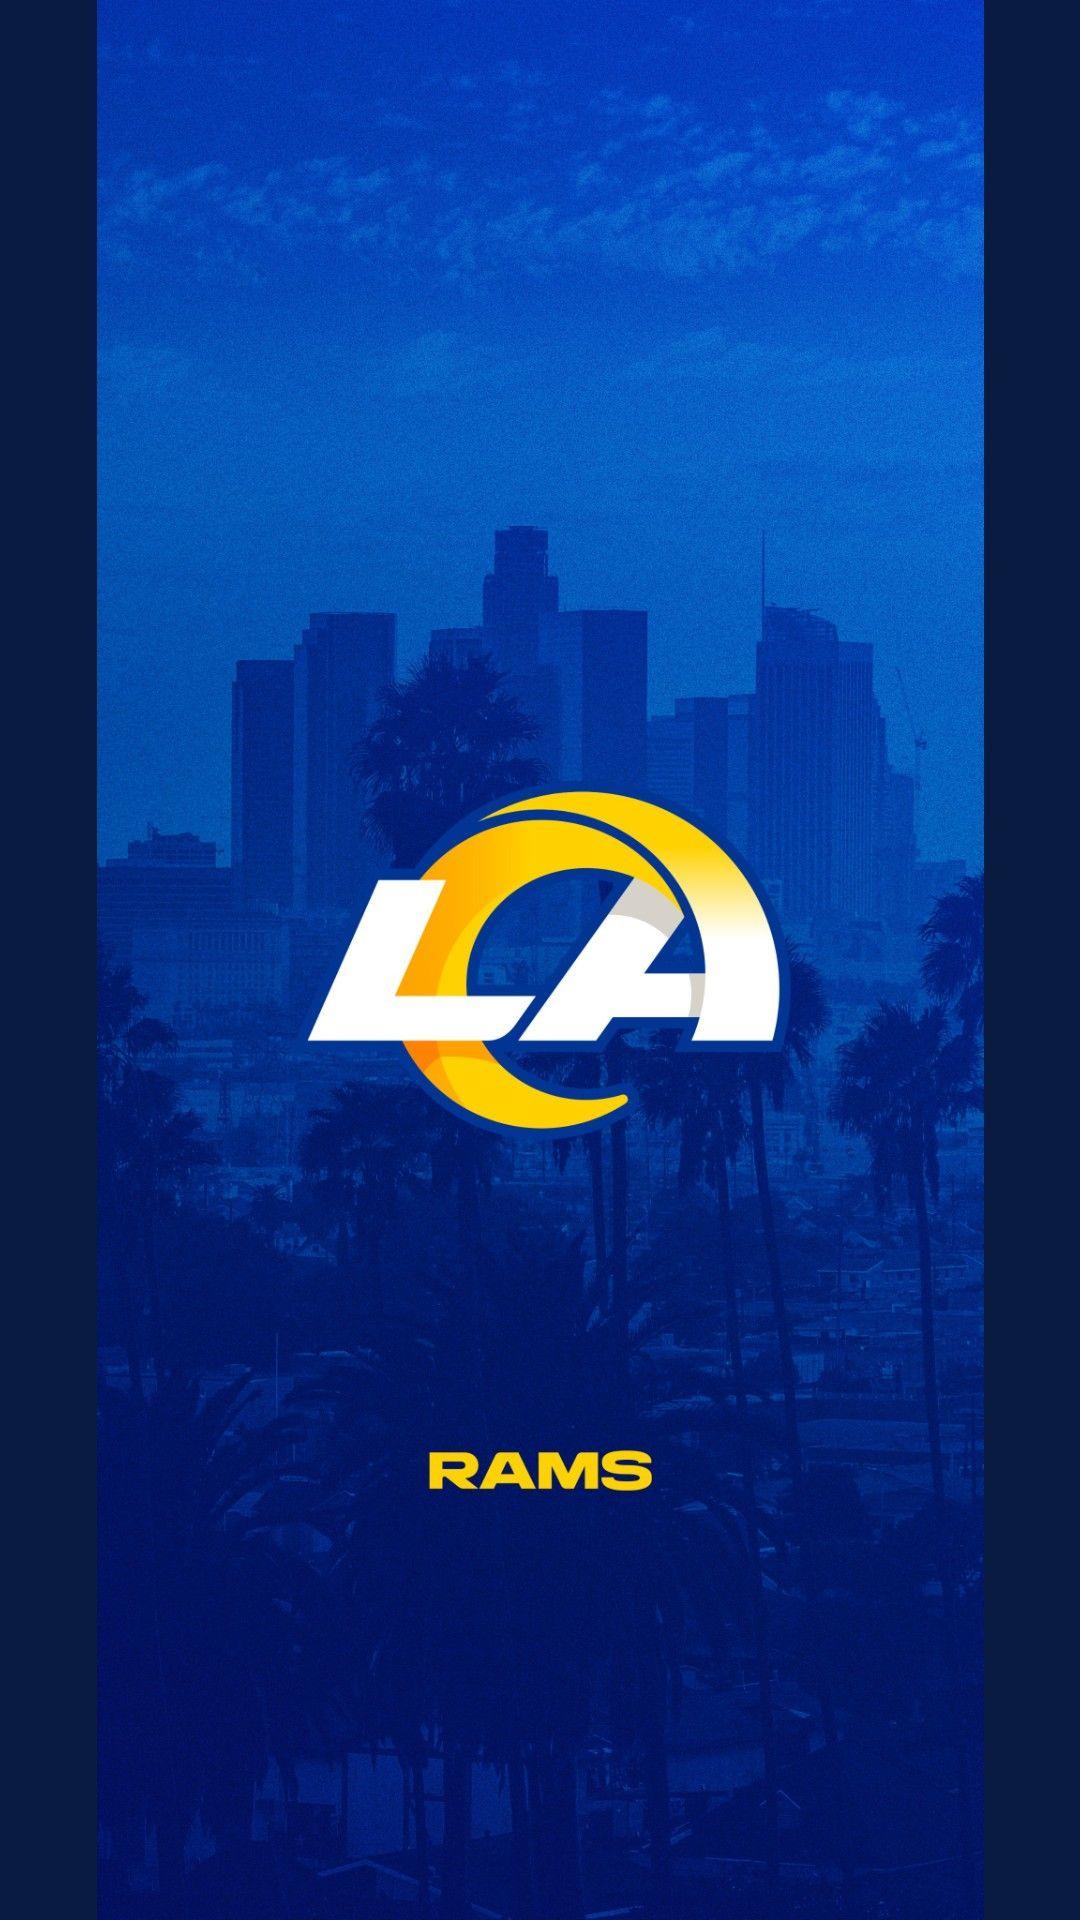 2020 Los Angeles Rams In 2020 Los Angeles Rams Logo Los Angeles Rams Rams Football